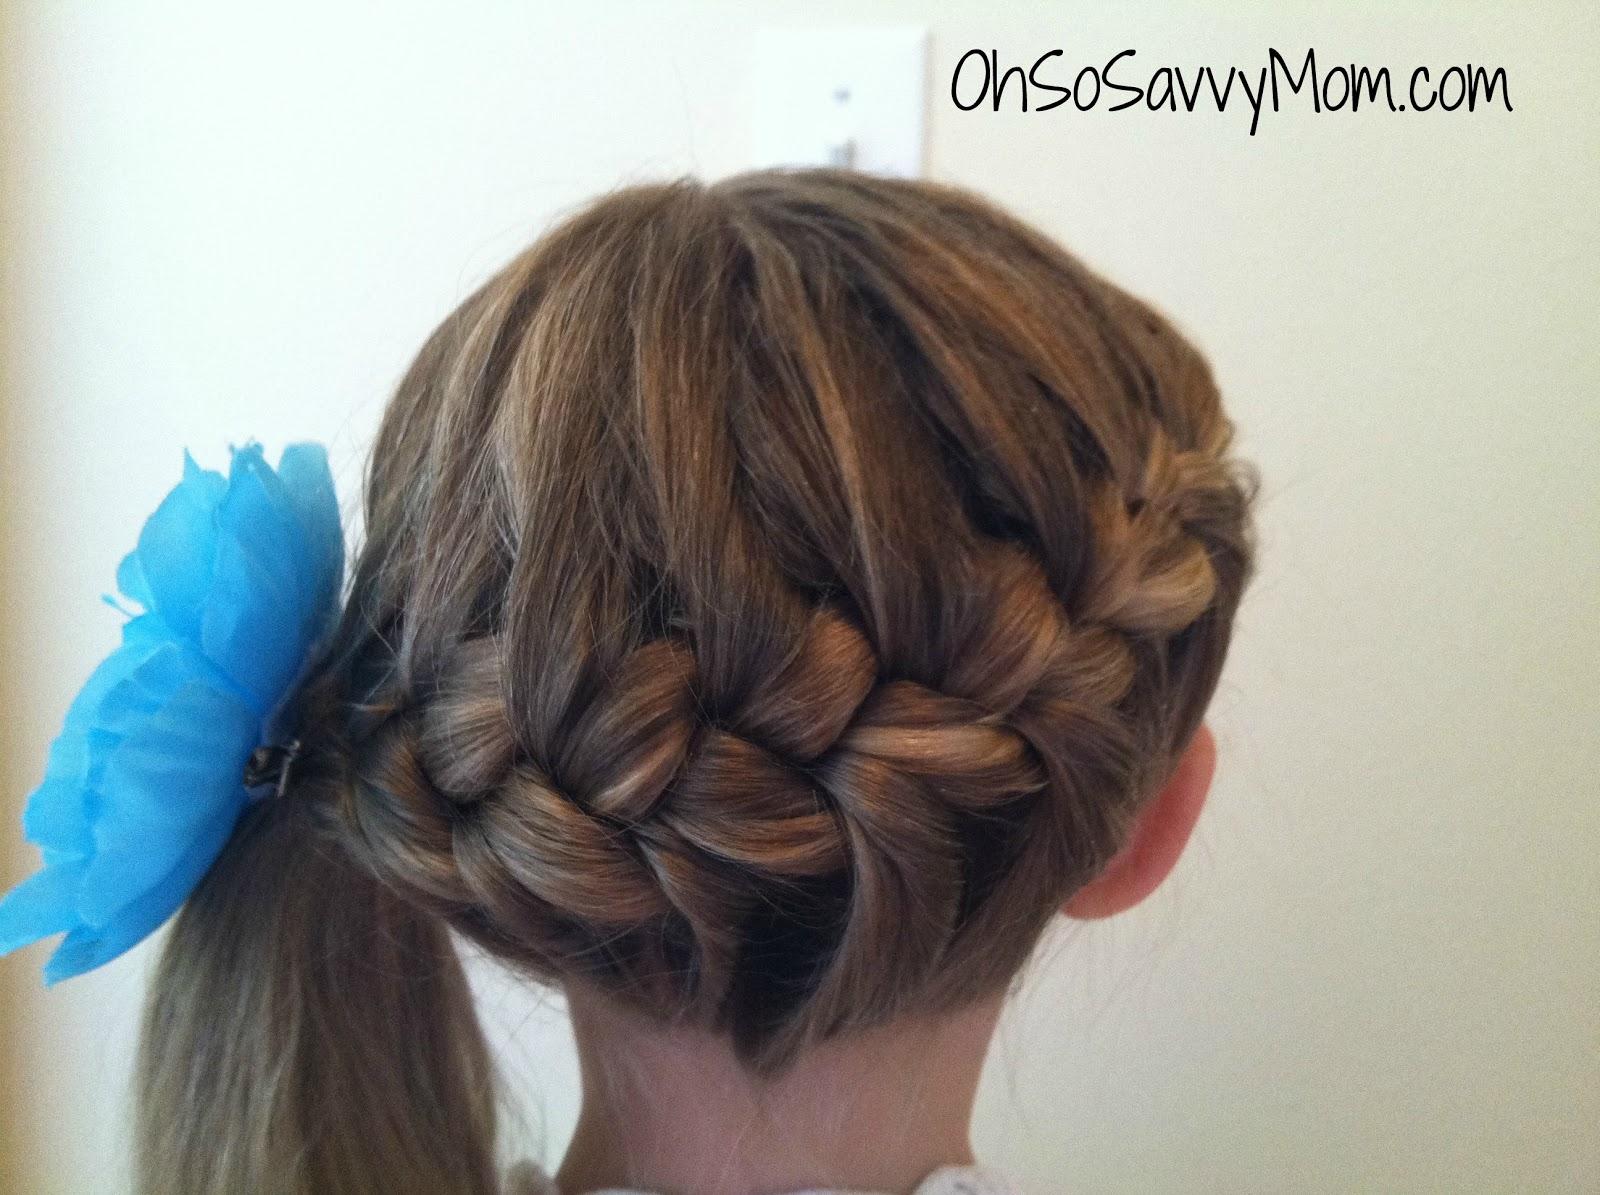 Wrap Around French Braid - Hair Tutorial - Oh So Savvy Mom